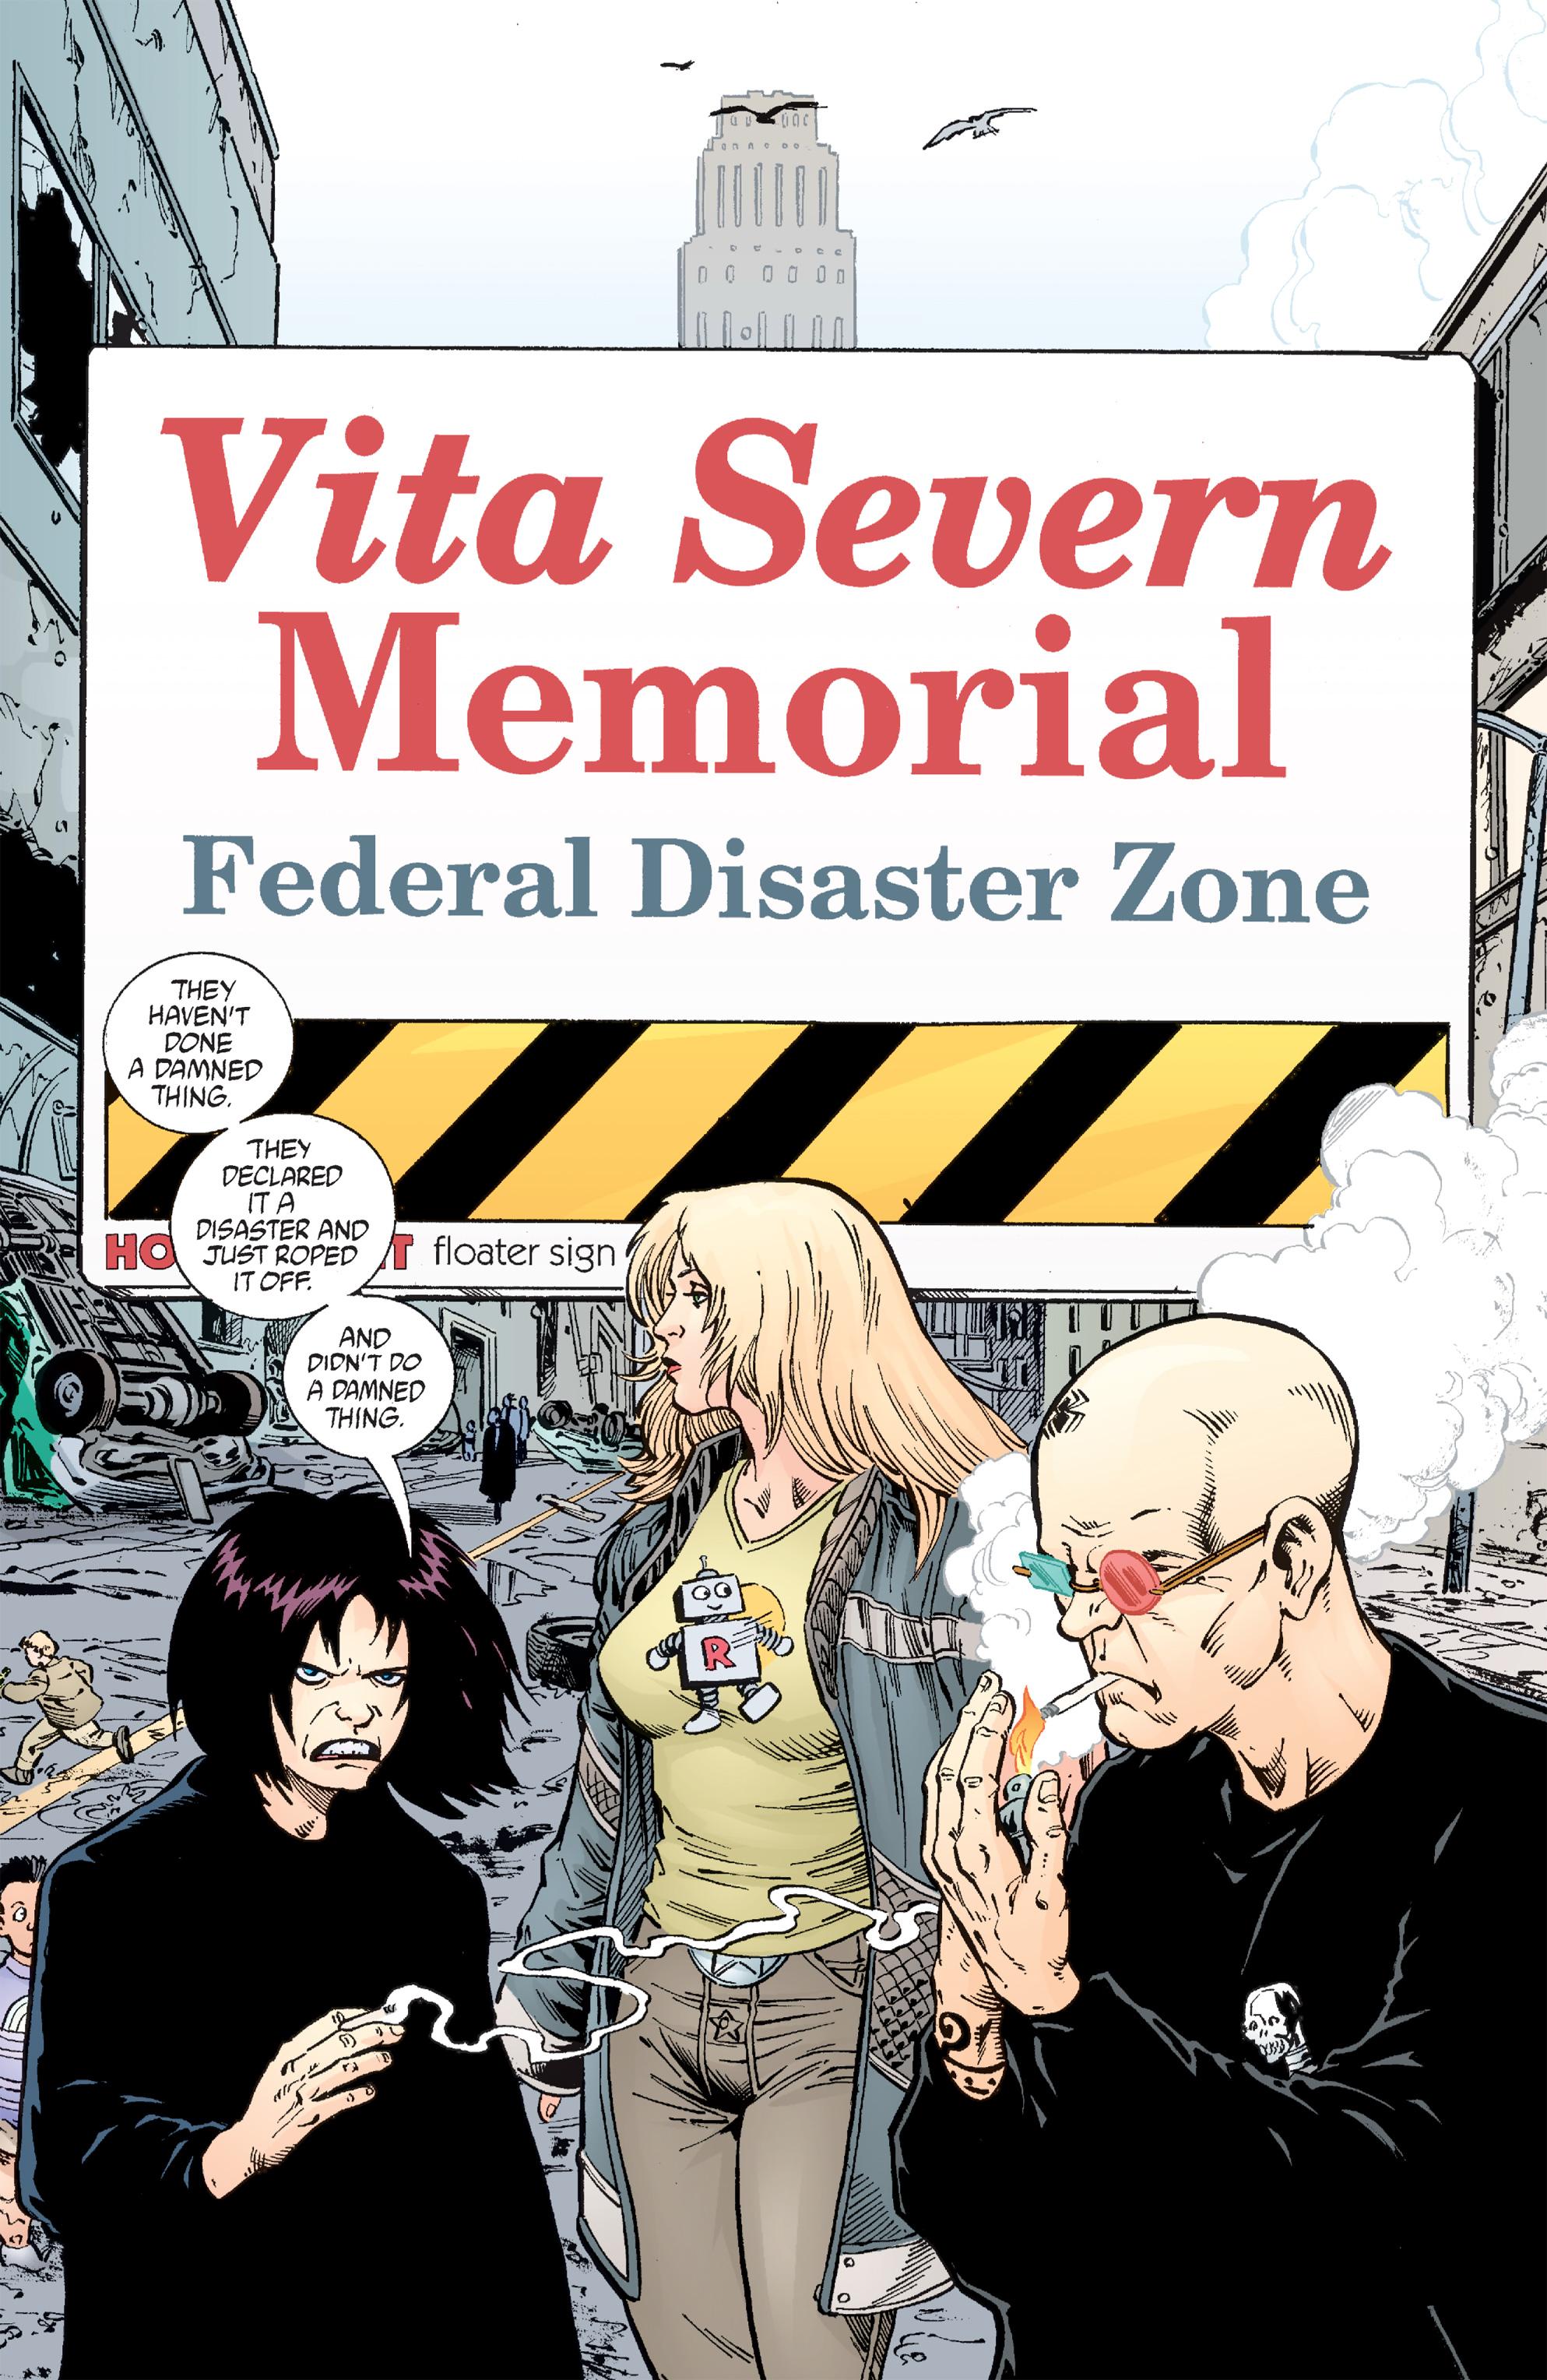 Read online Transmetropolitan comic -  Issue #49 - 10